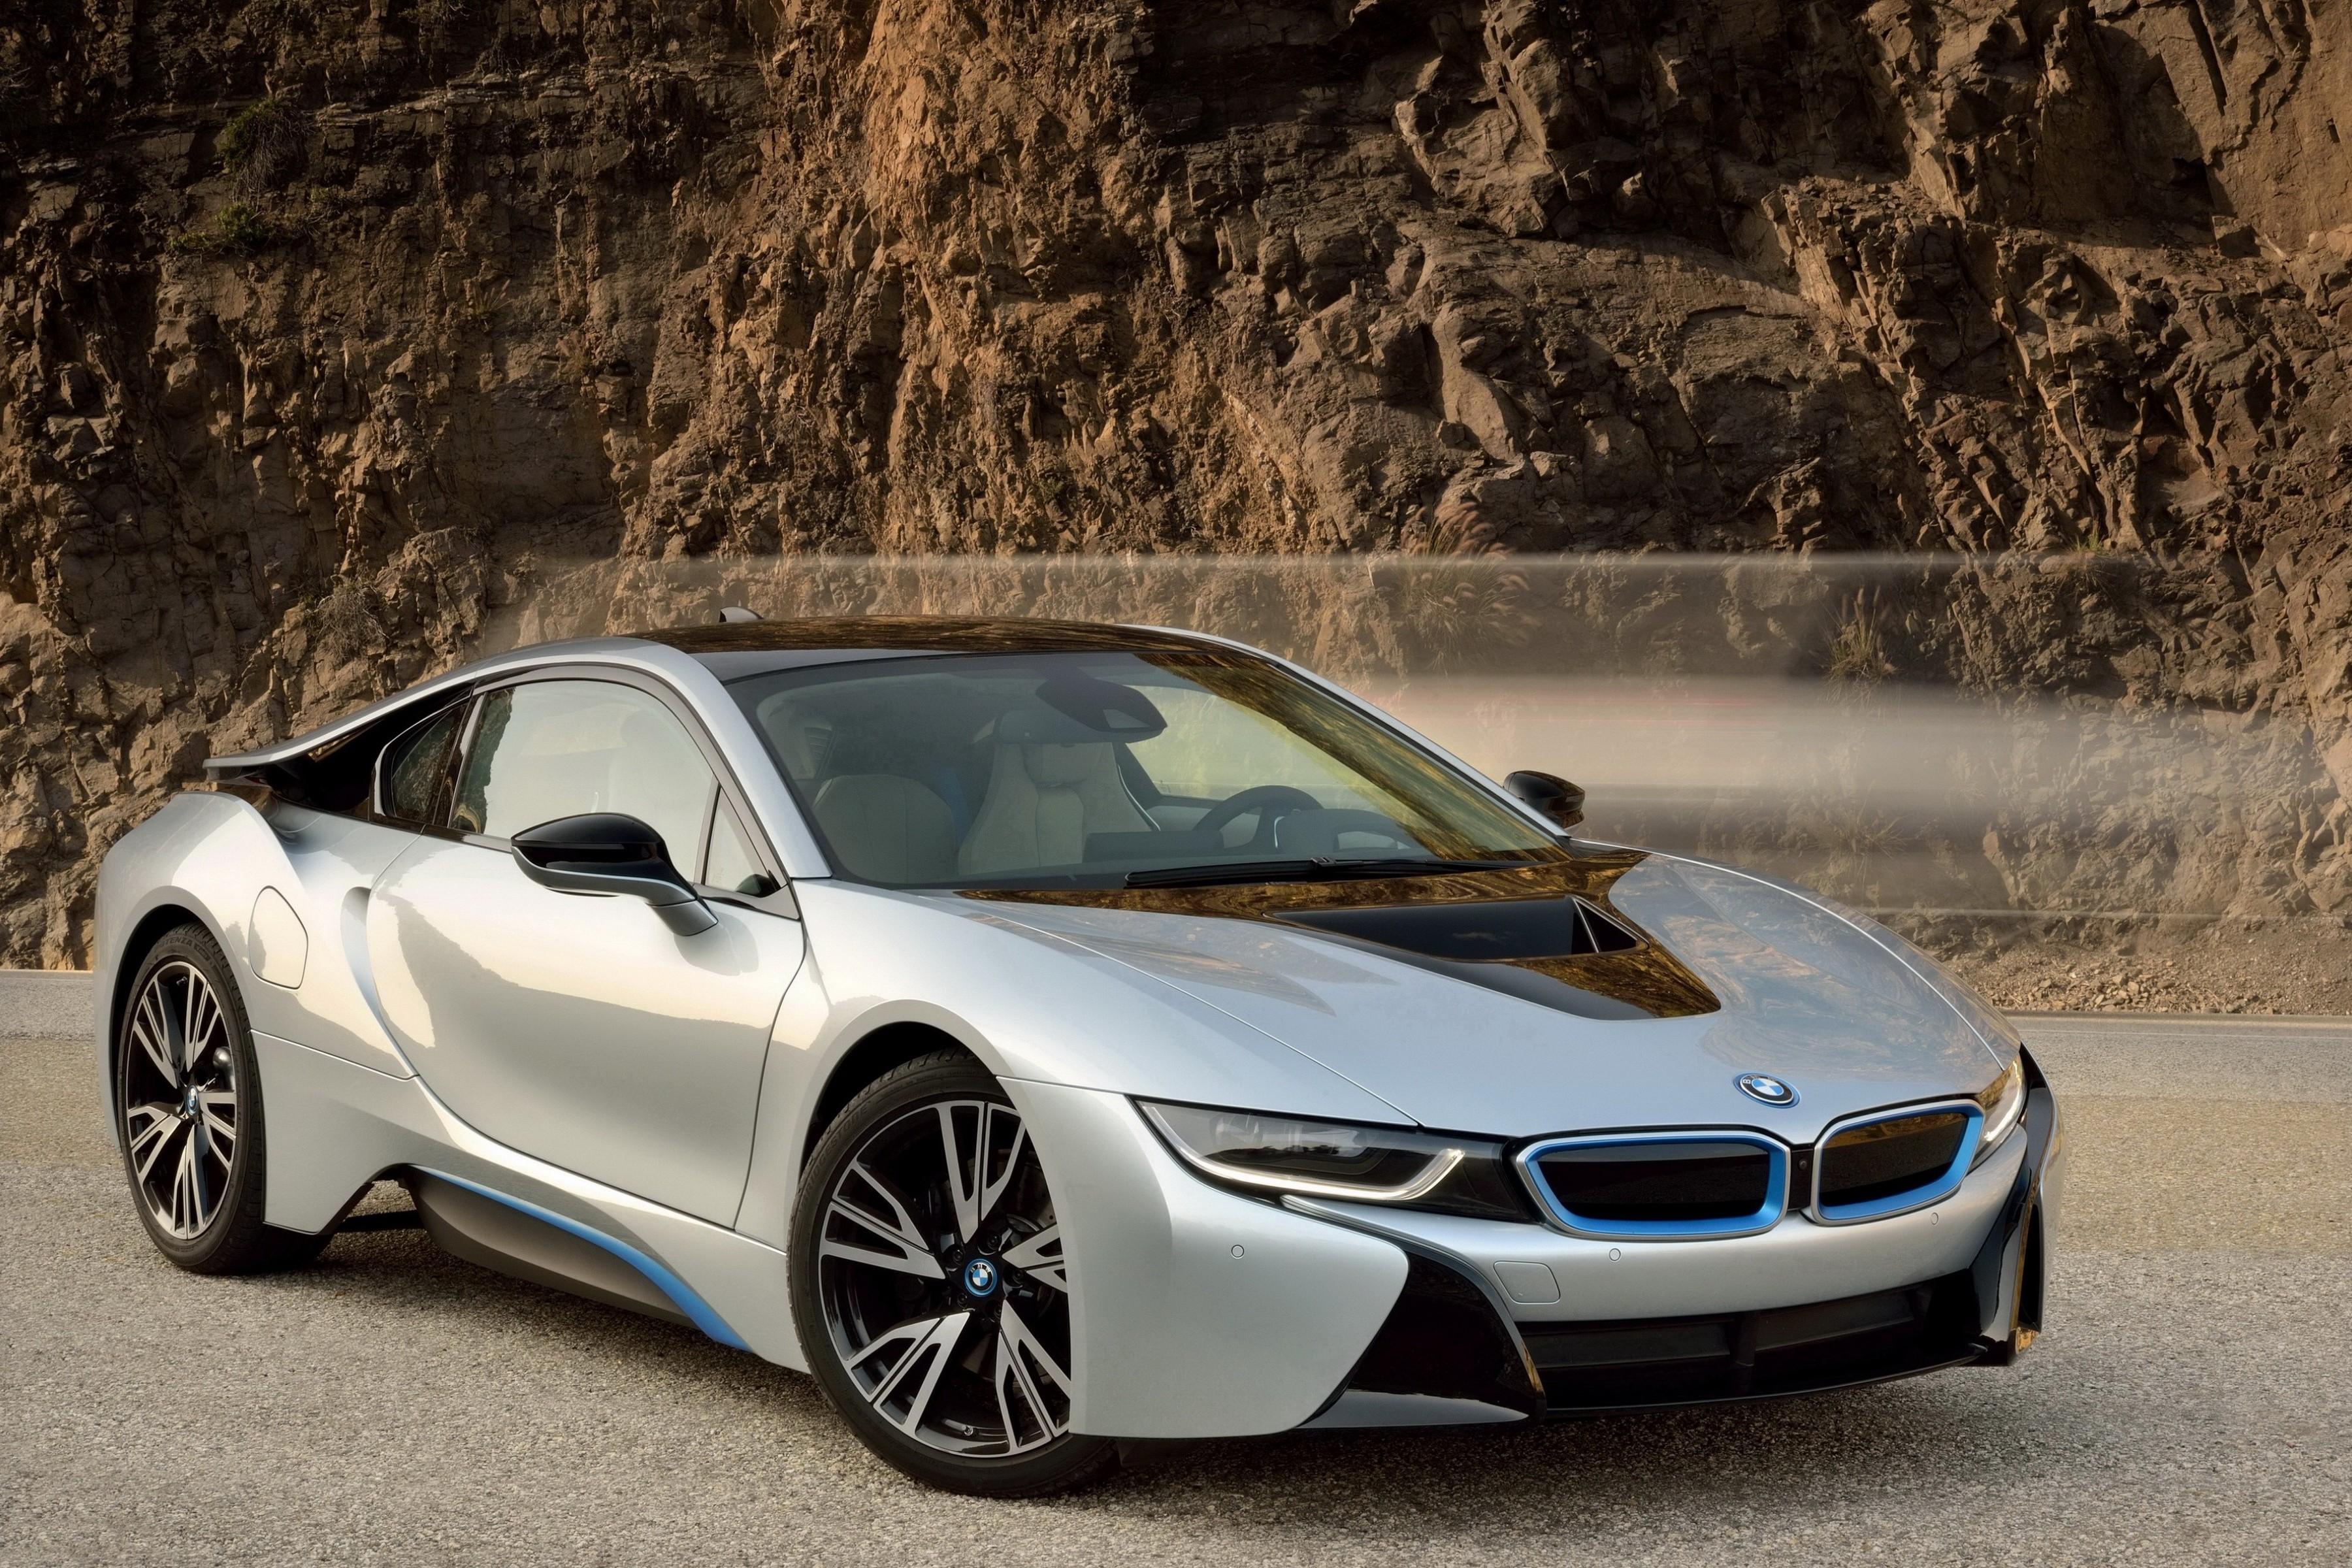 BMW i8 HD Wallpaper | Background Image | 3600x2400 ...